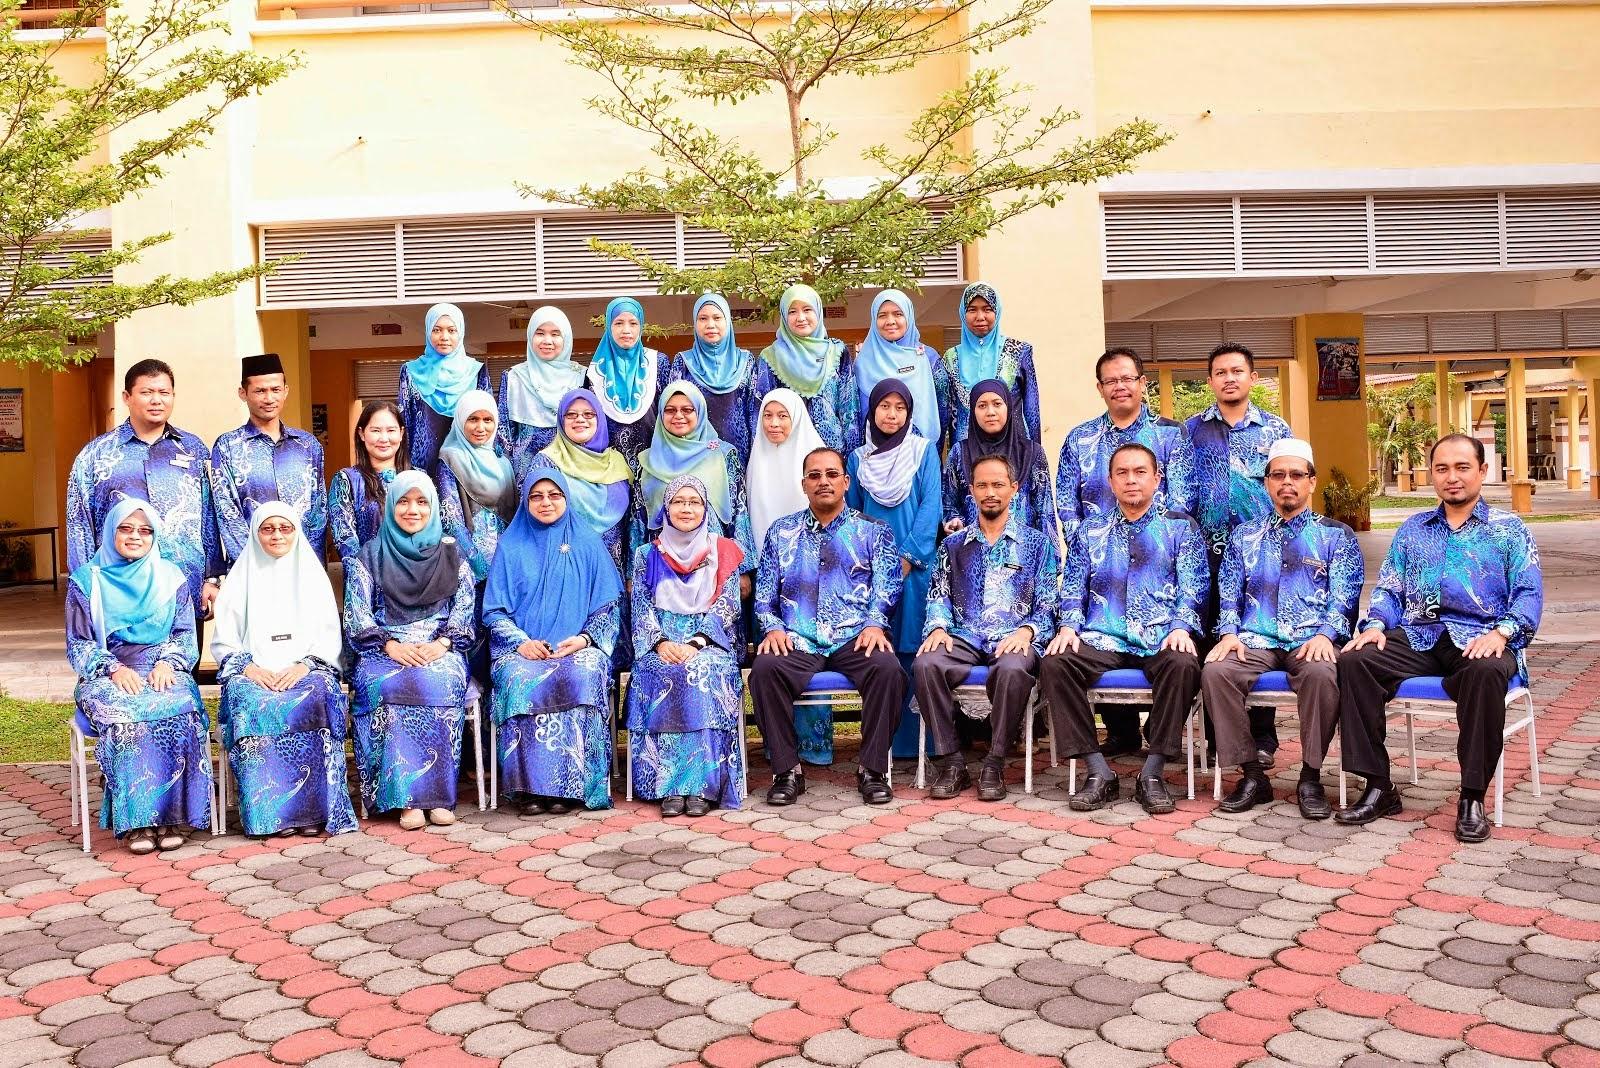 GURU SMKPG 2014